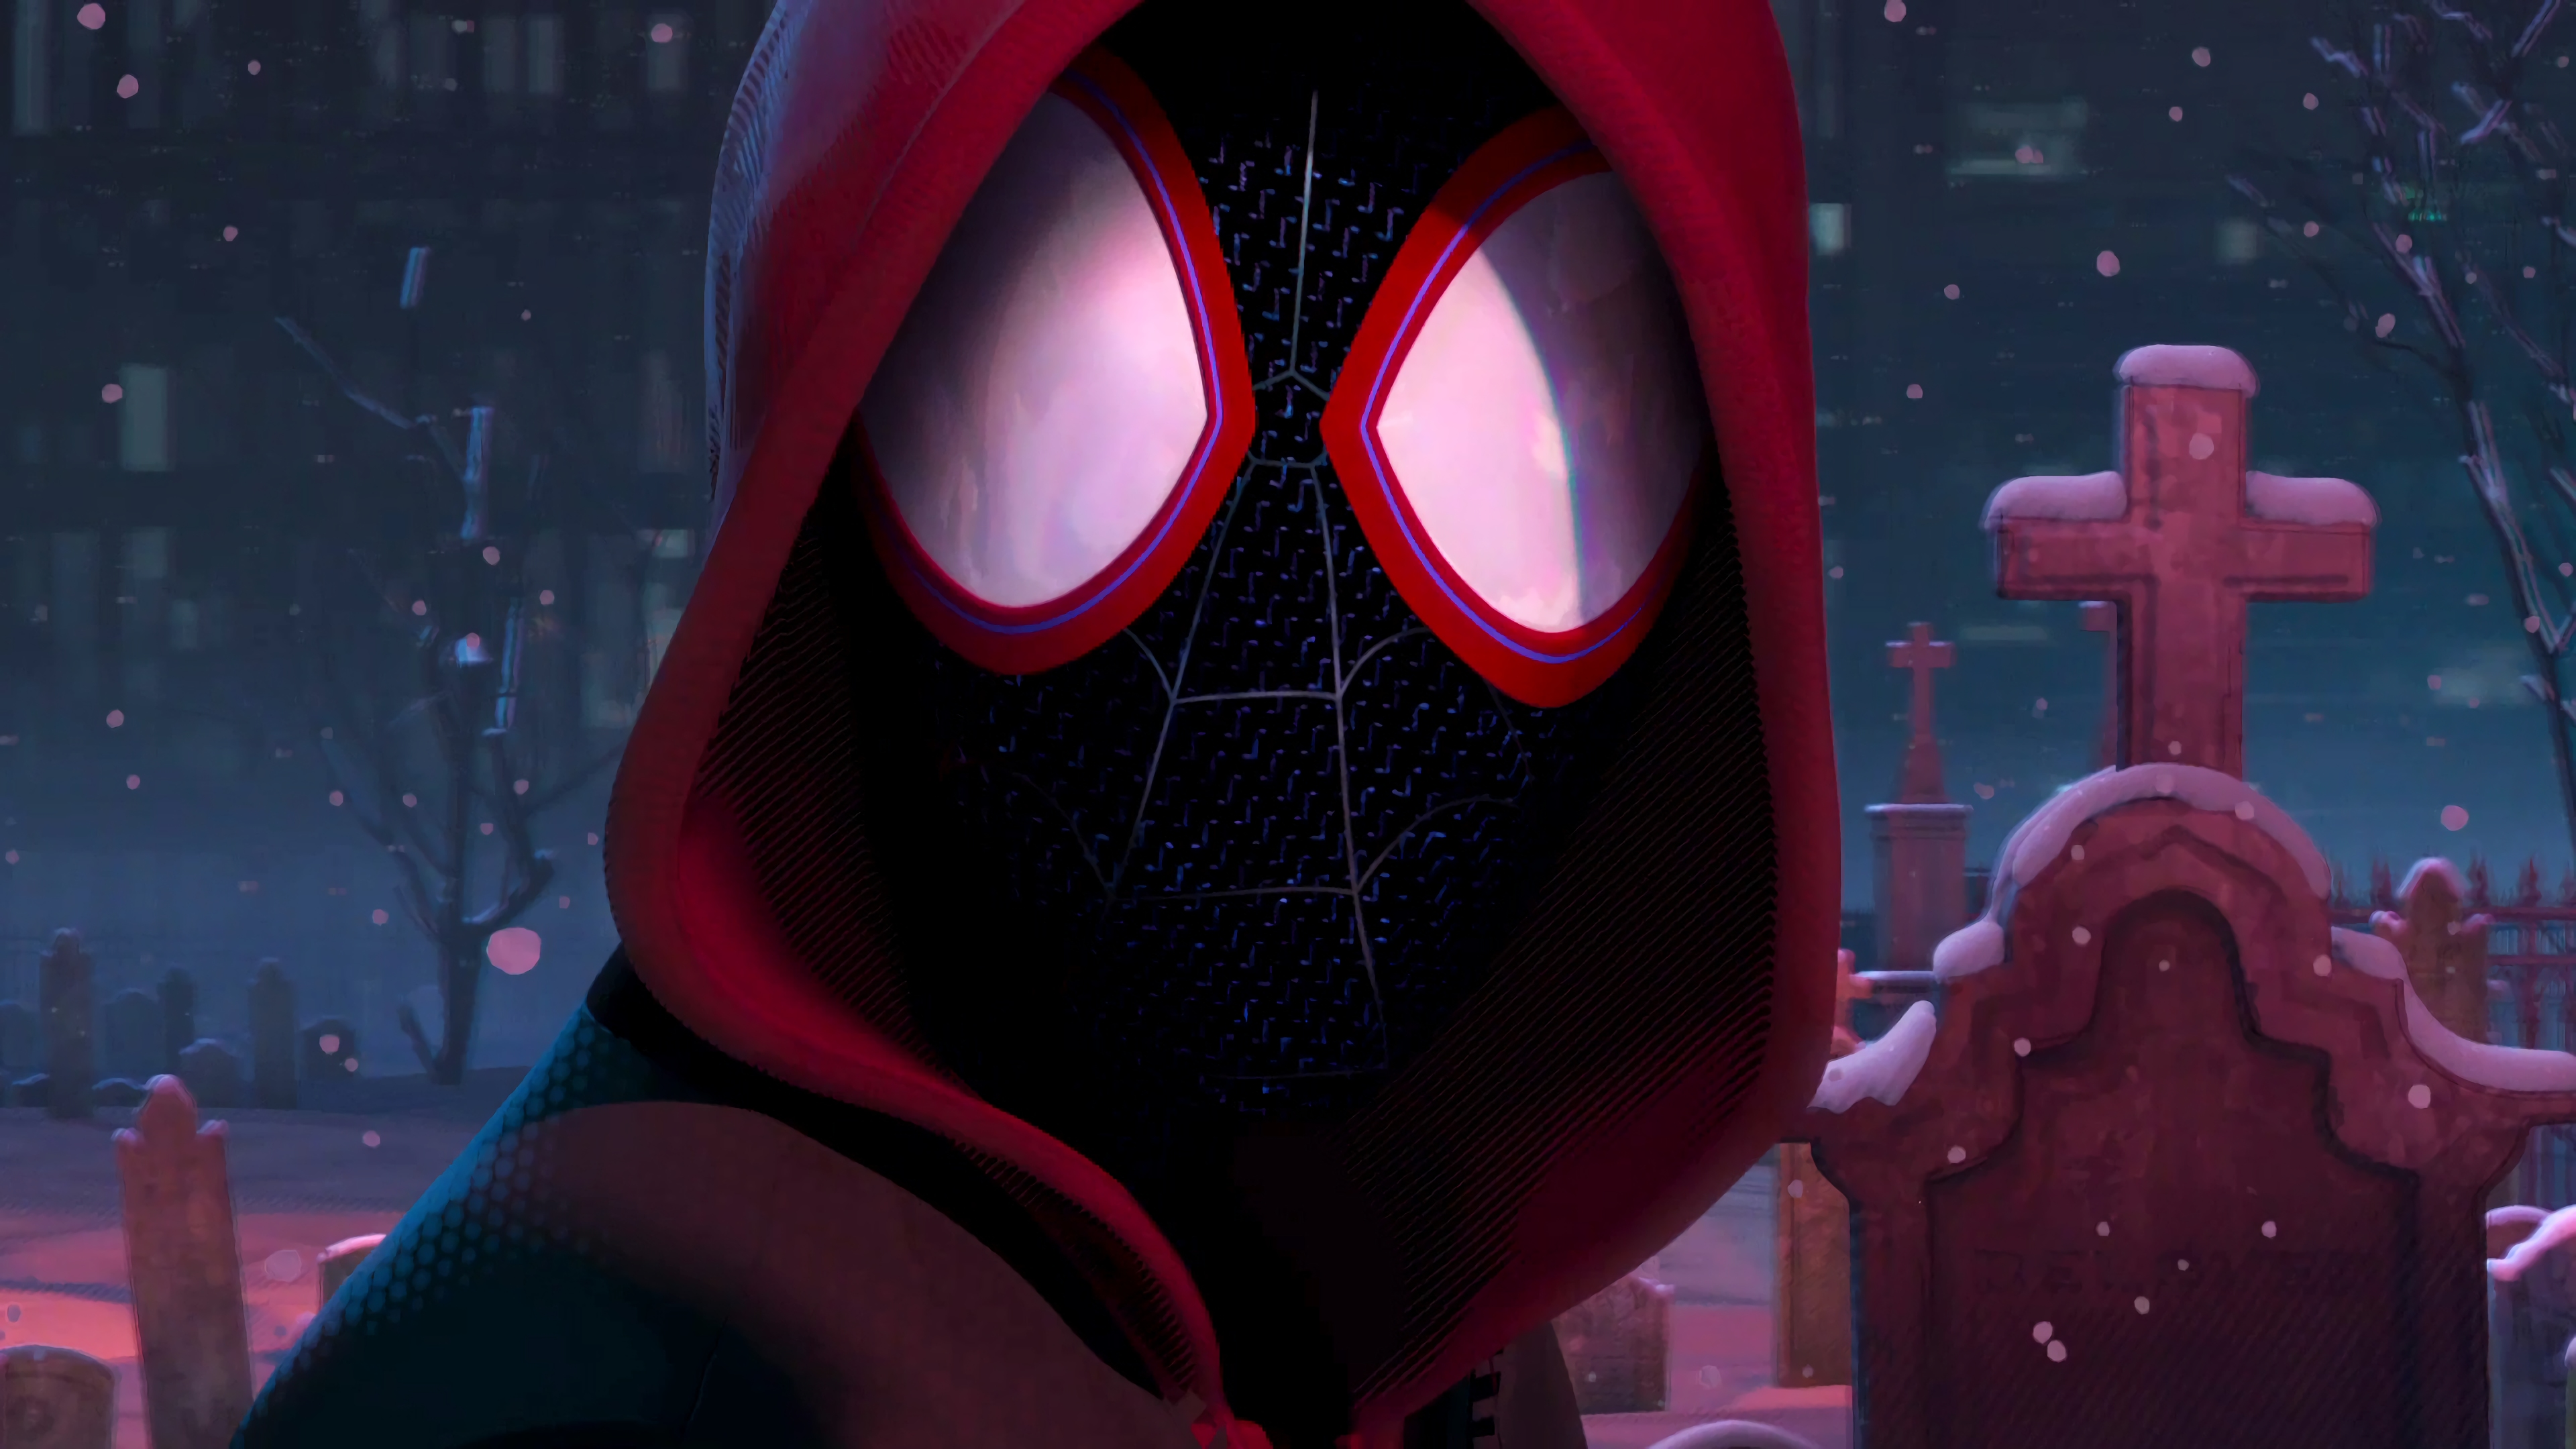 Spider Man Into The Spider Verse 4k Ultra Hd Wallpaper Background